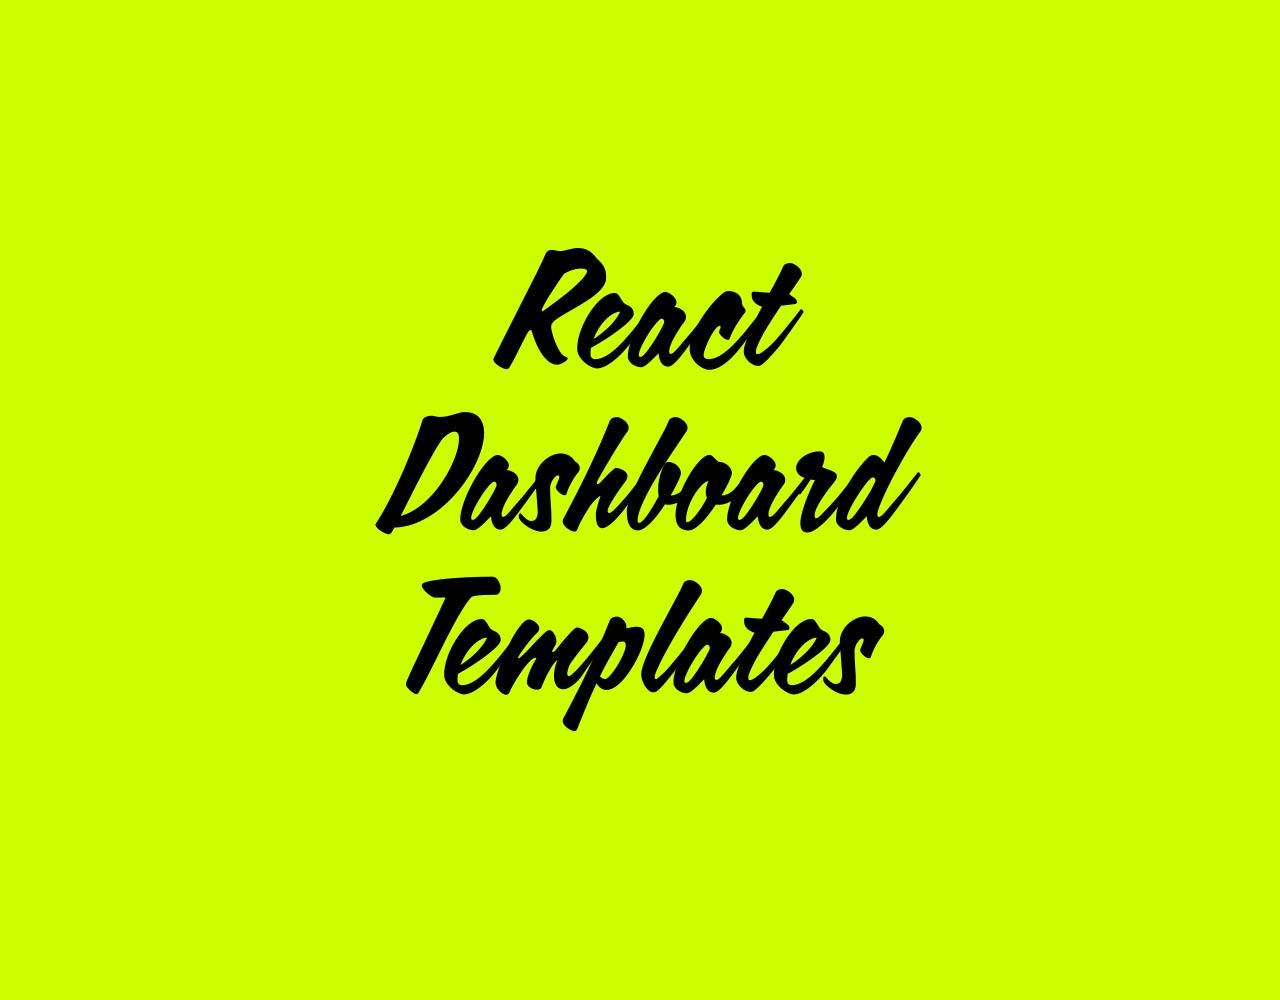 React Dashboard Templates